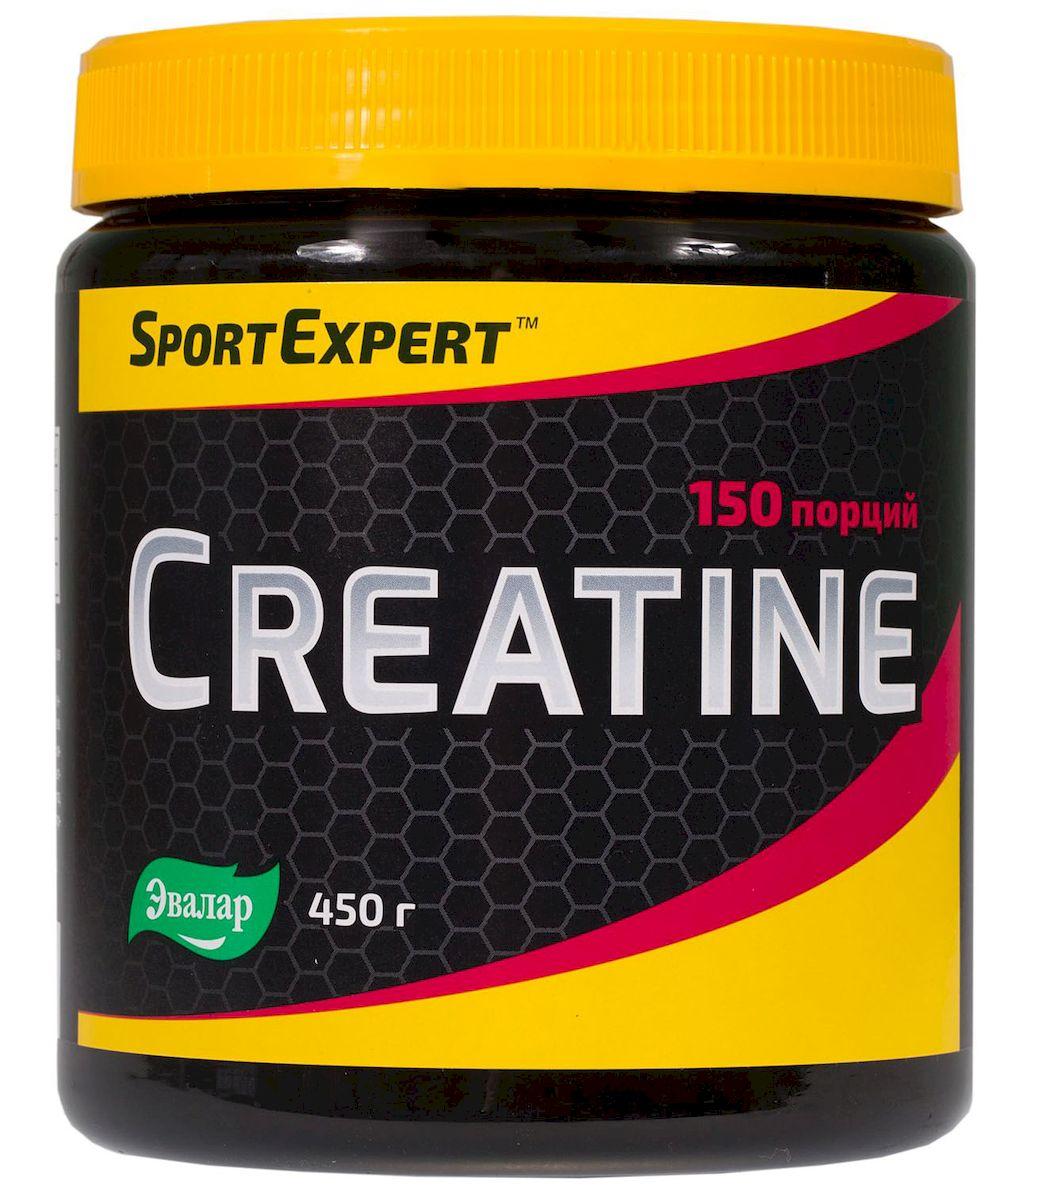 SportExpert Creatine, Креатин, порошок, банка 450 г